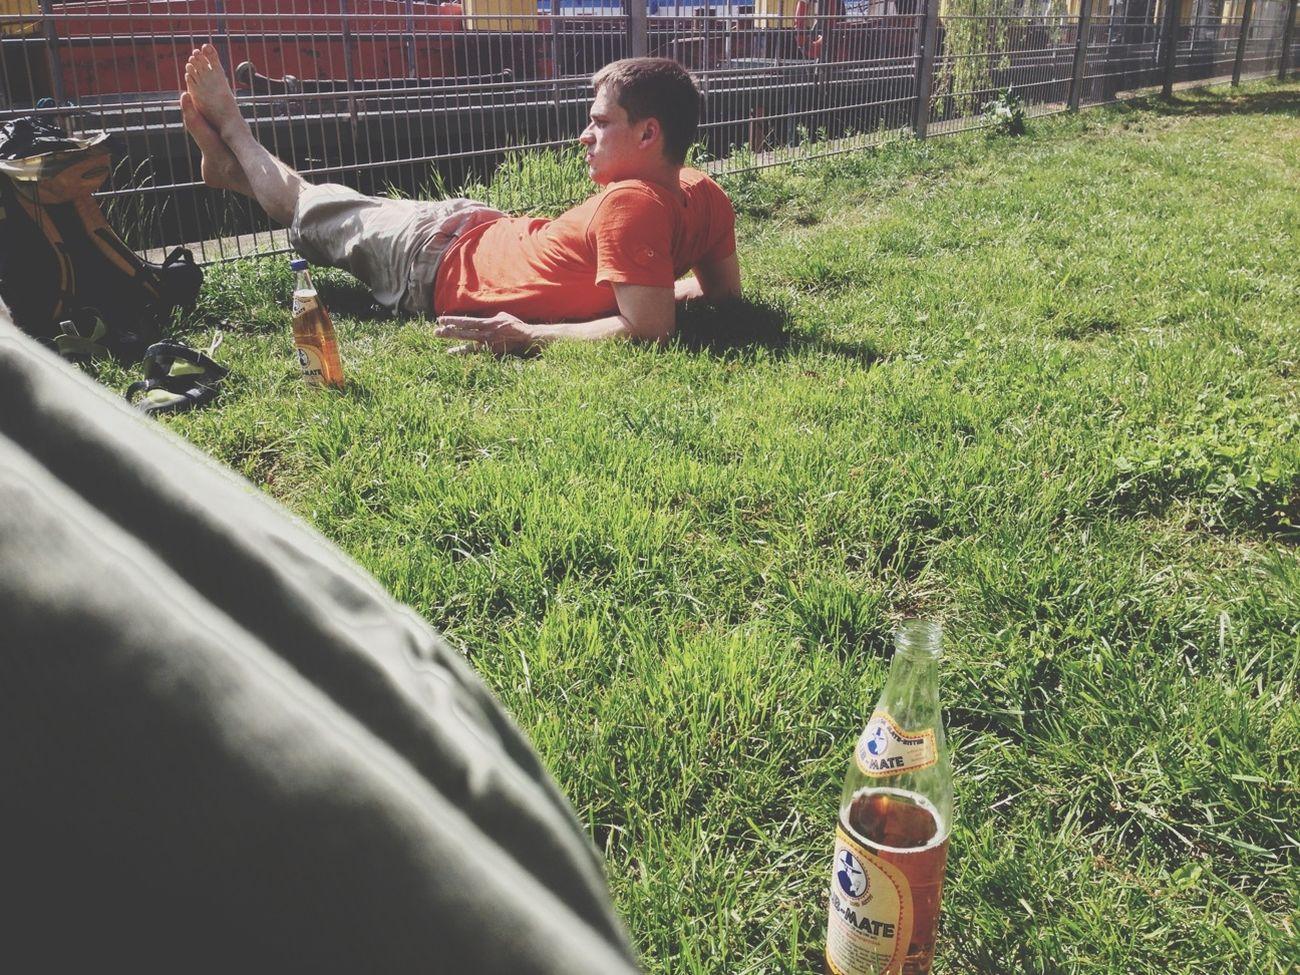 Mate, Kippe, Bouldern